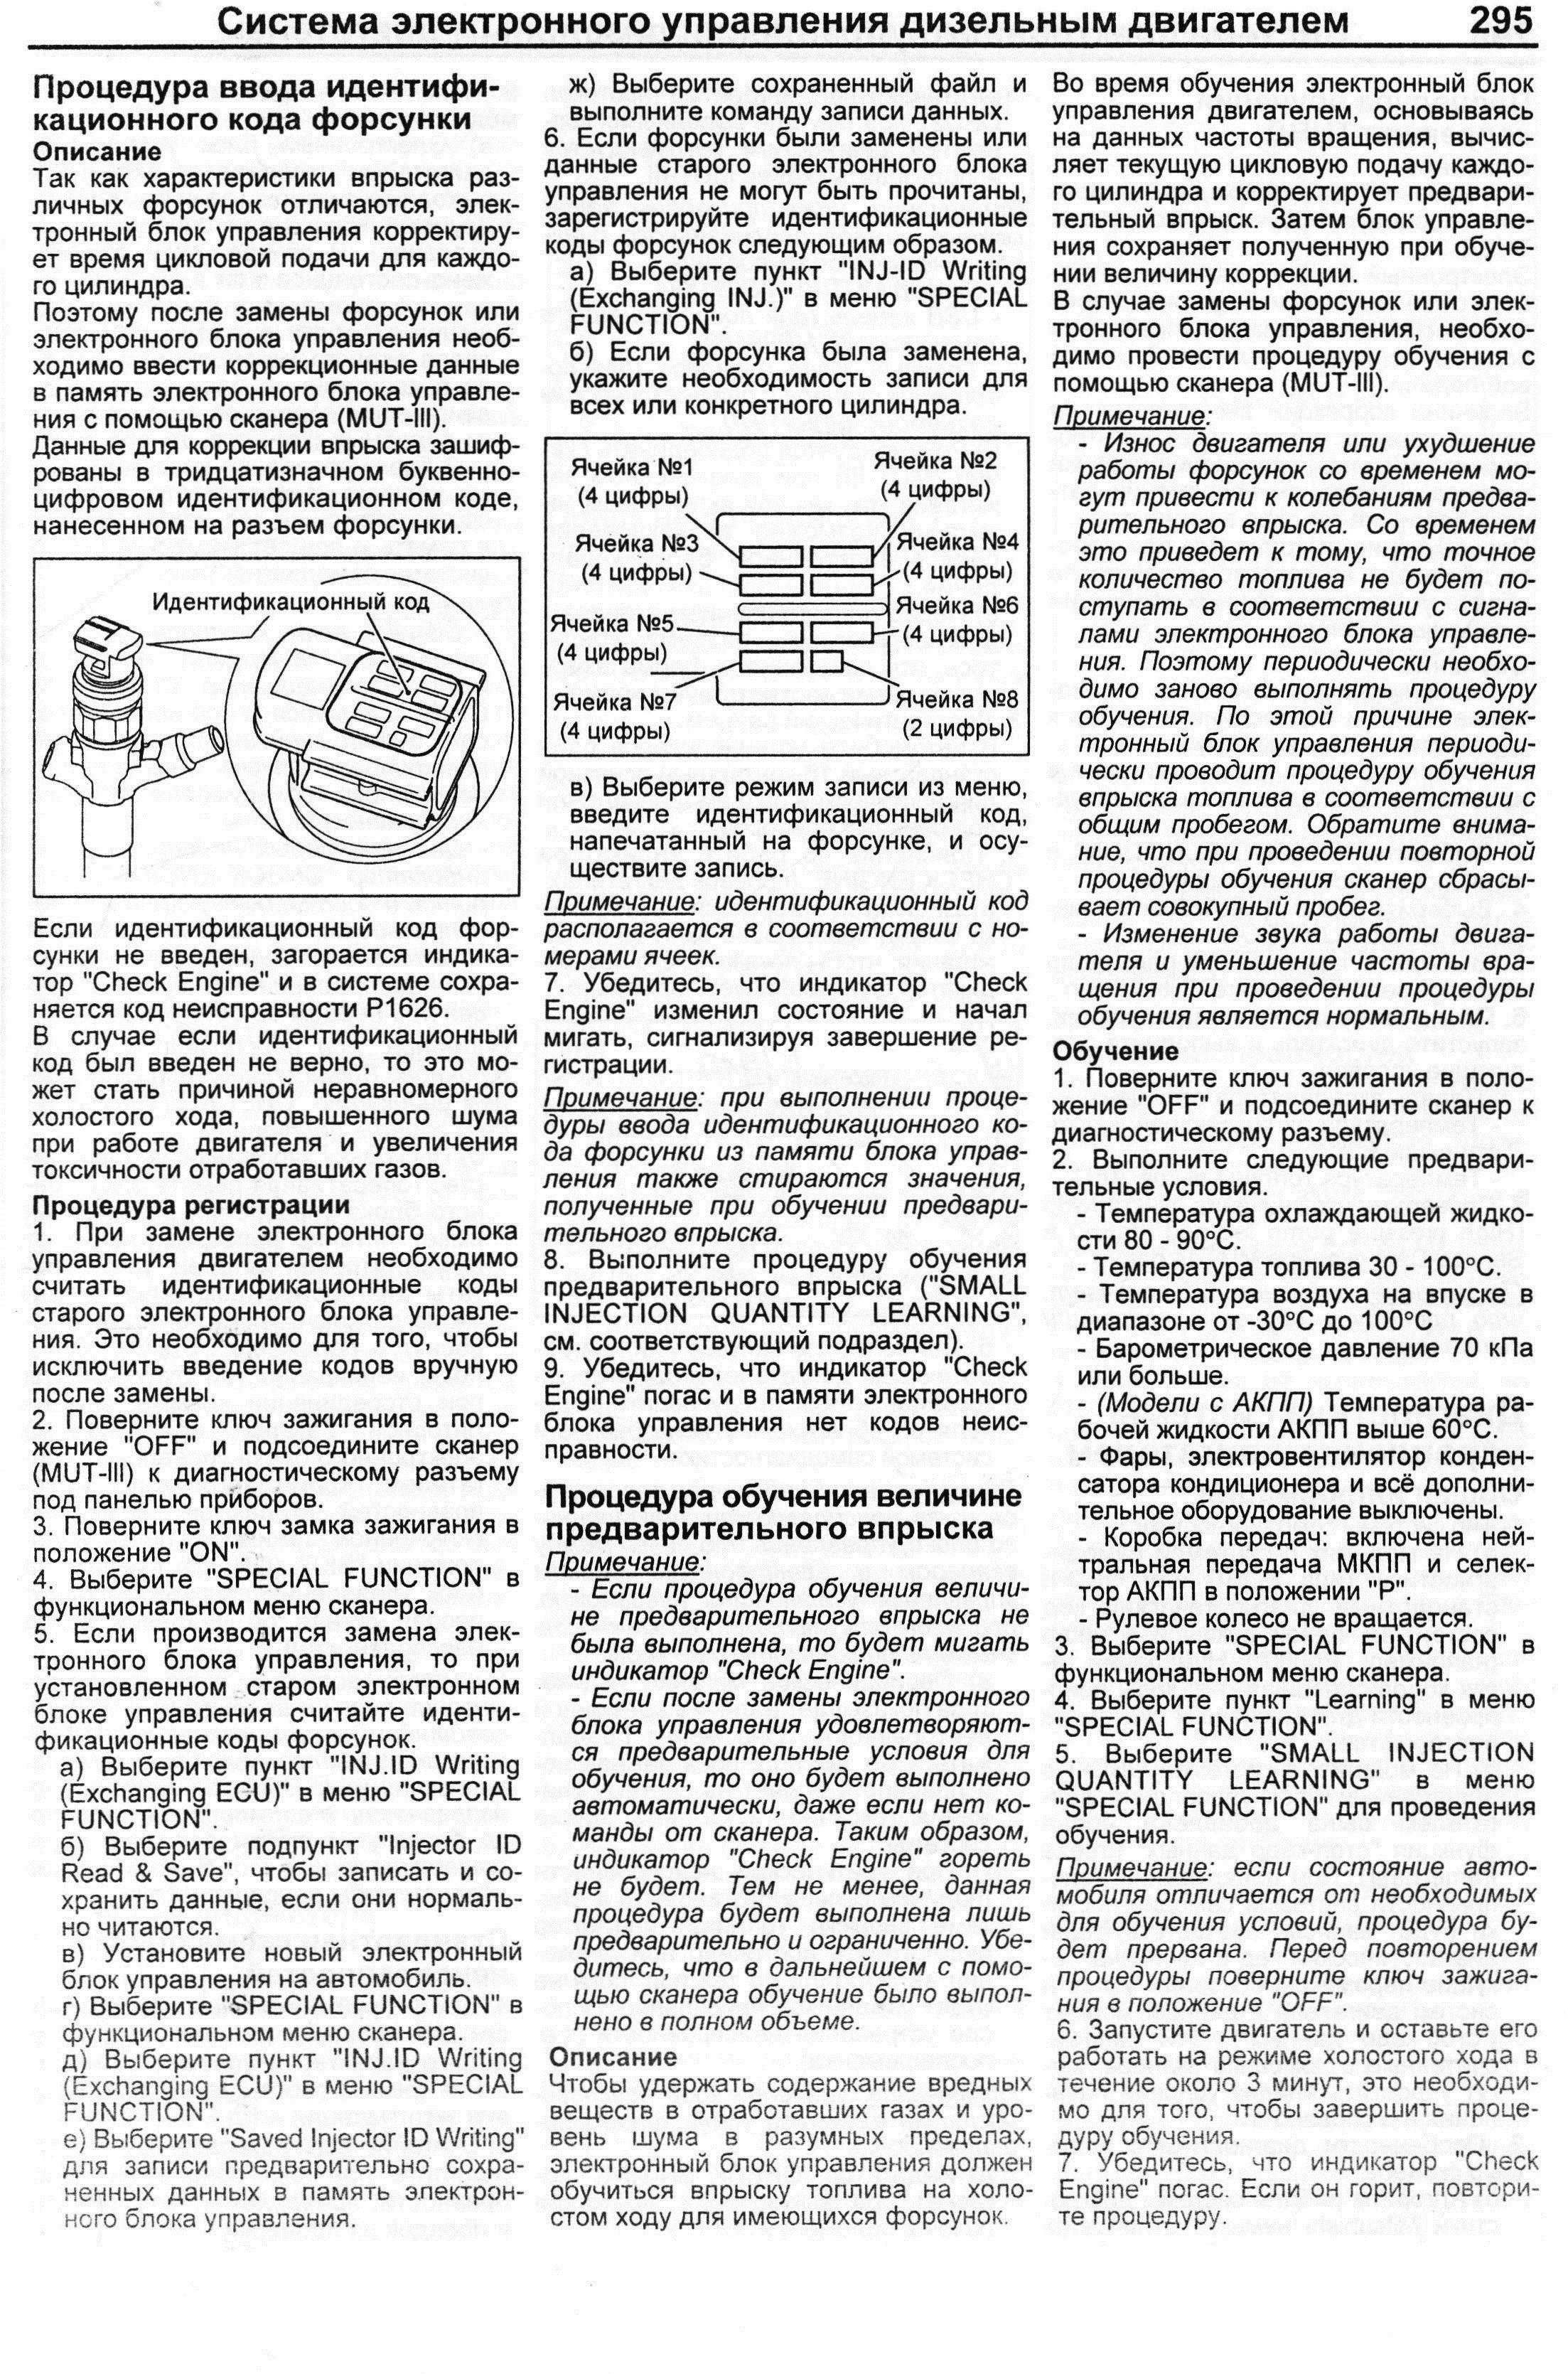 Программа для диагностики митсубиси паджеро джуниор